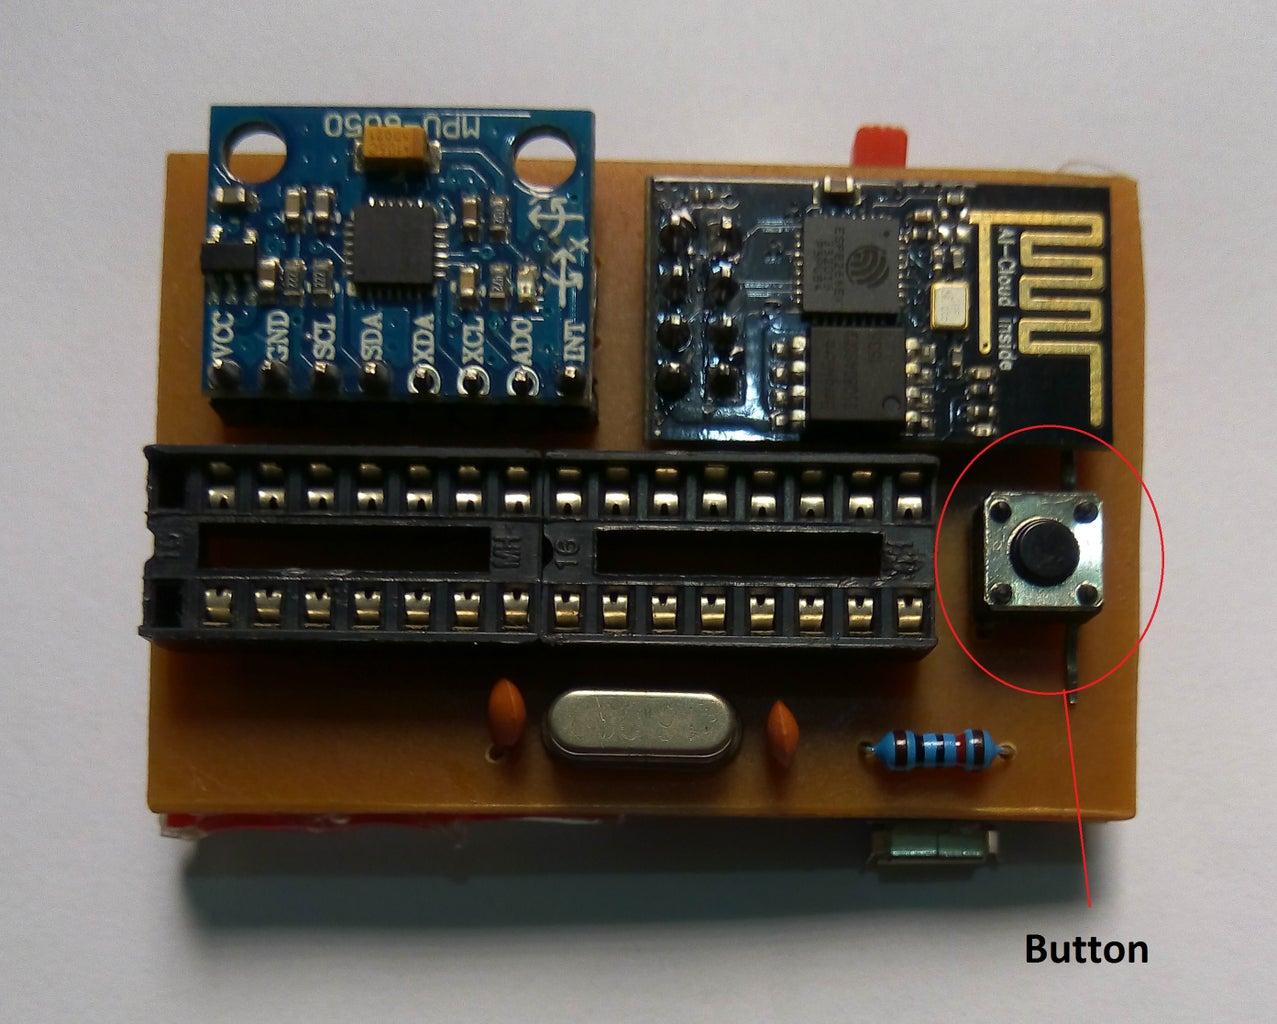 Solder MPU6050 Sensor Board to PCB